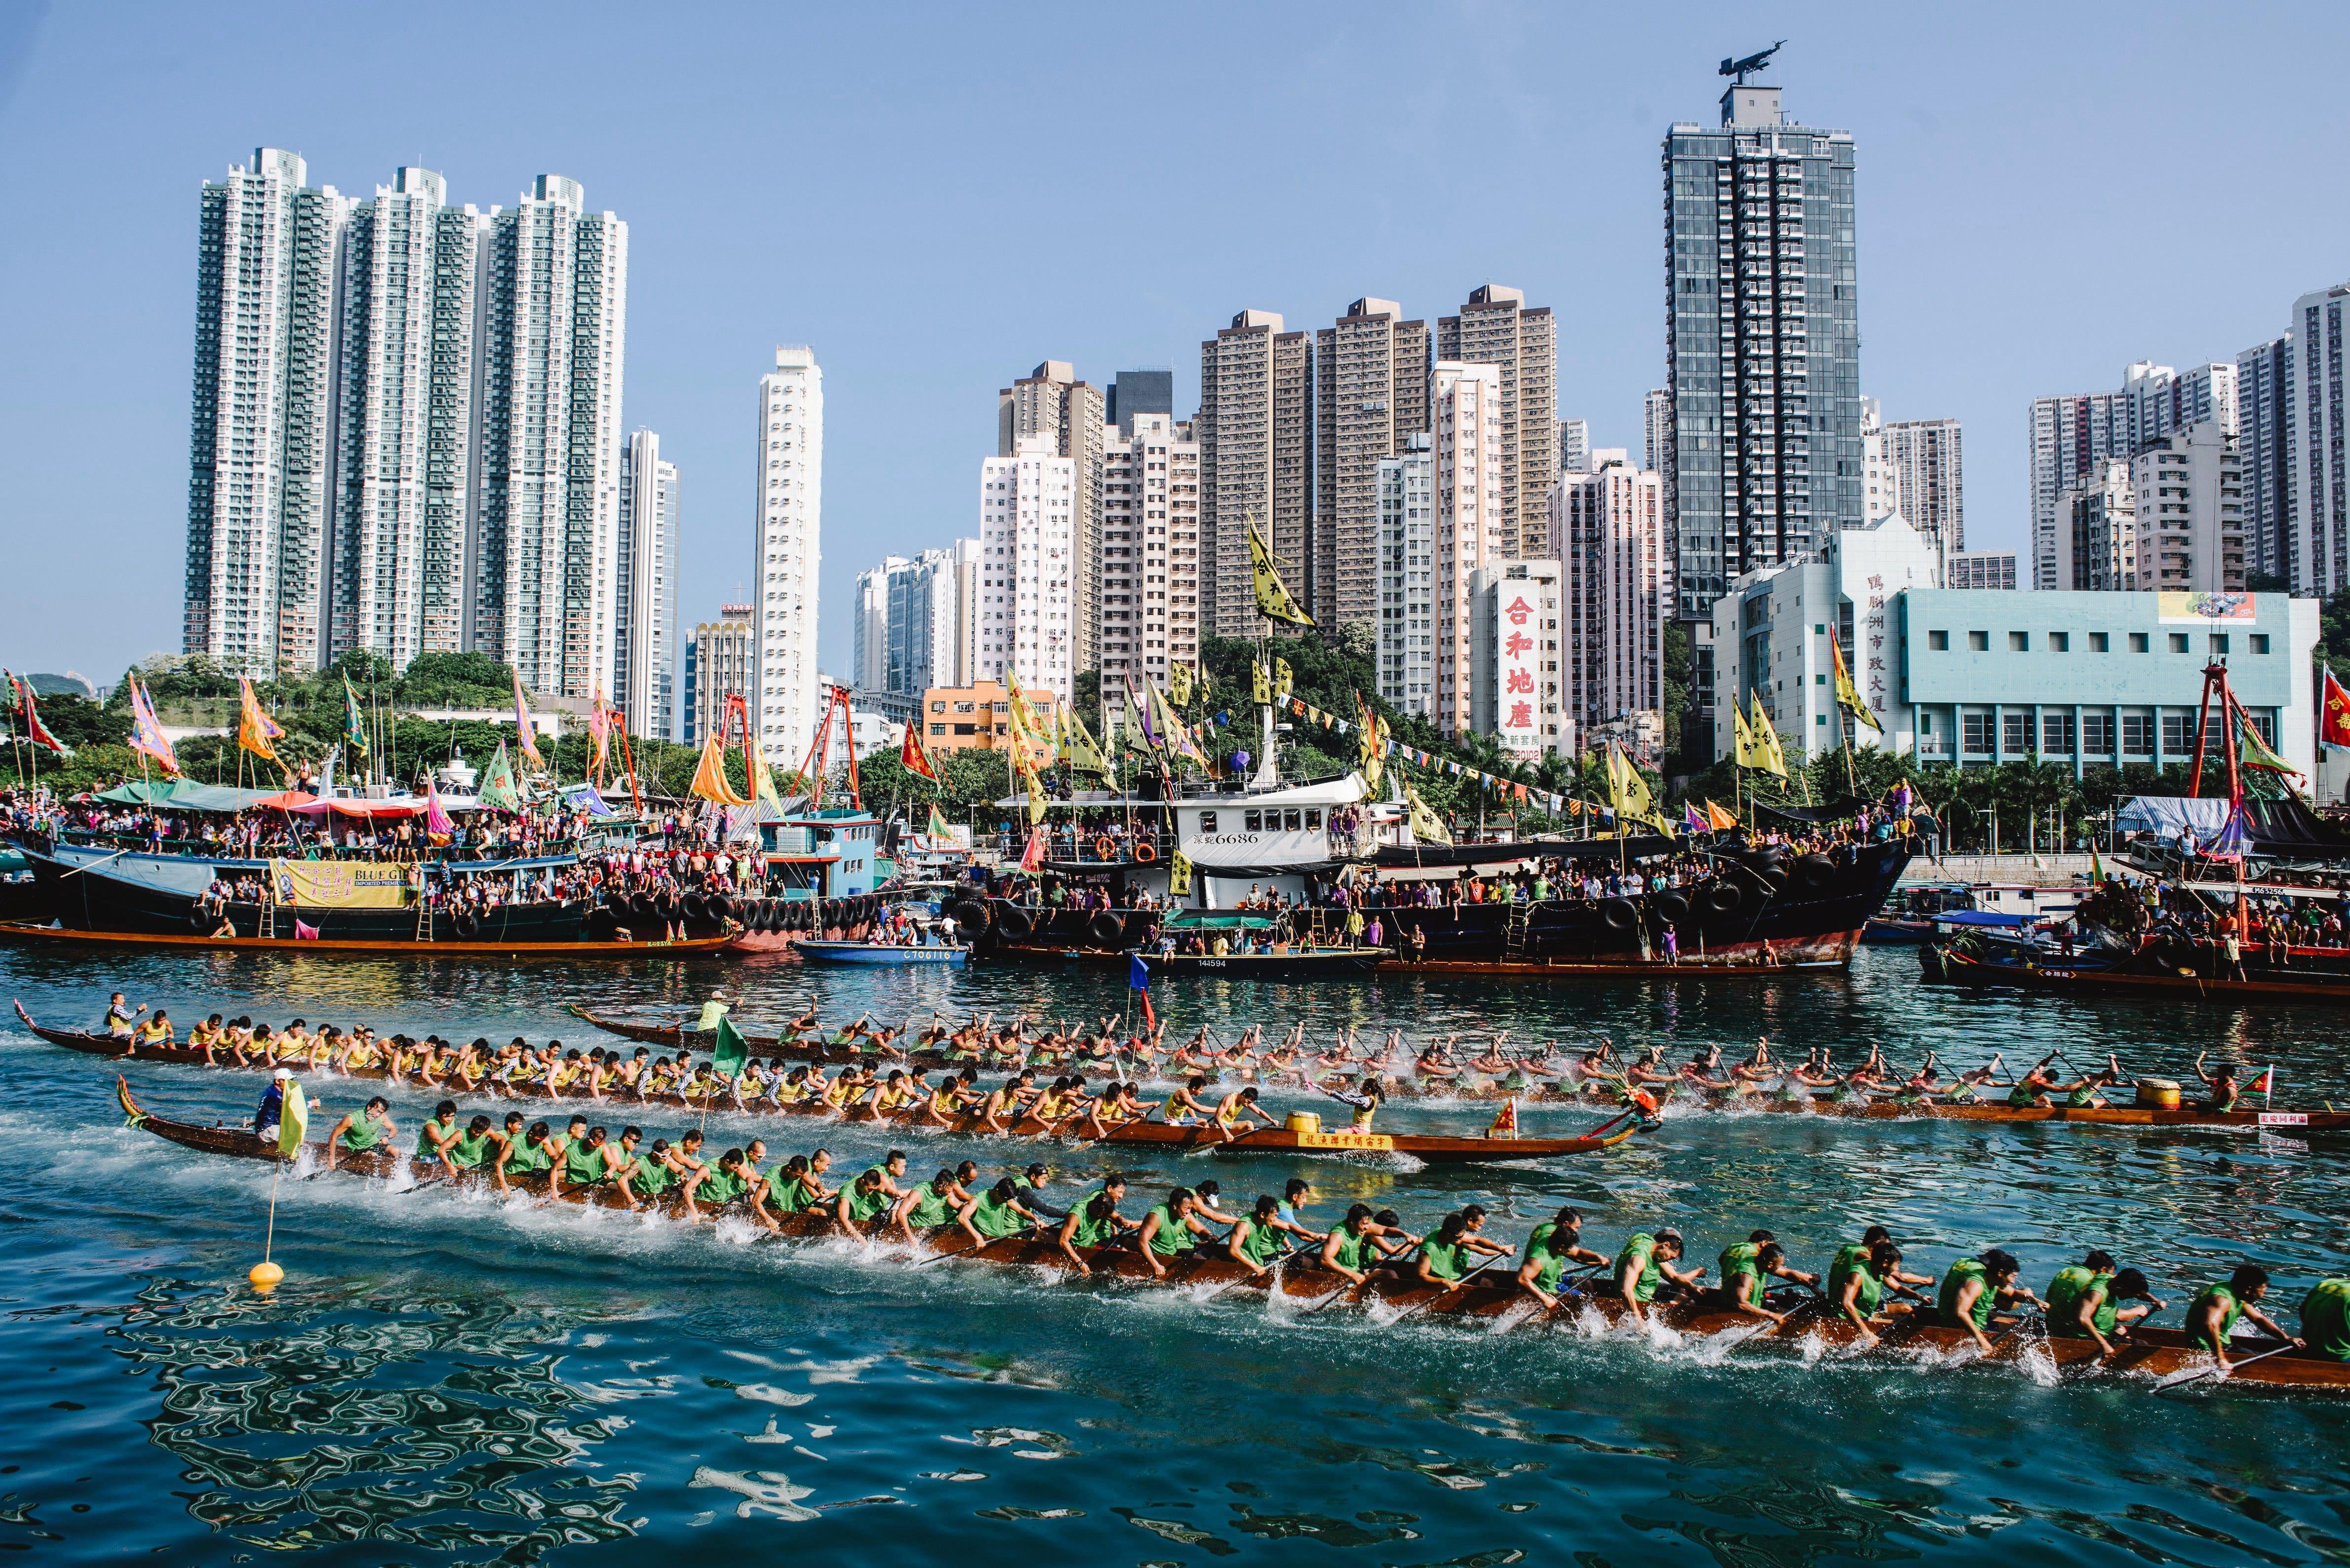 Dragon Boat Festival in Hong Kong